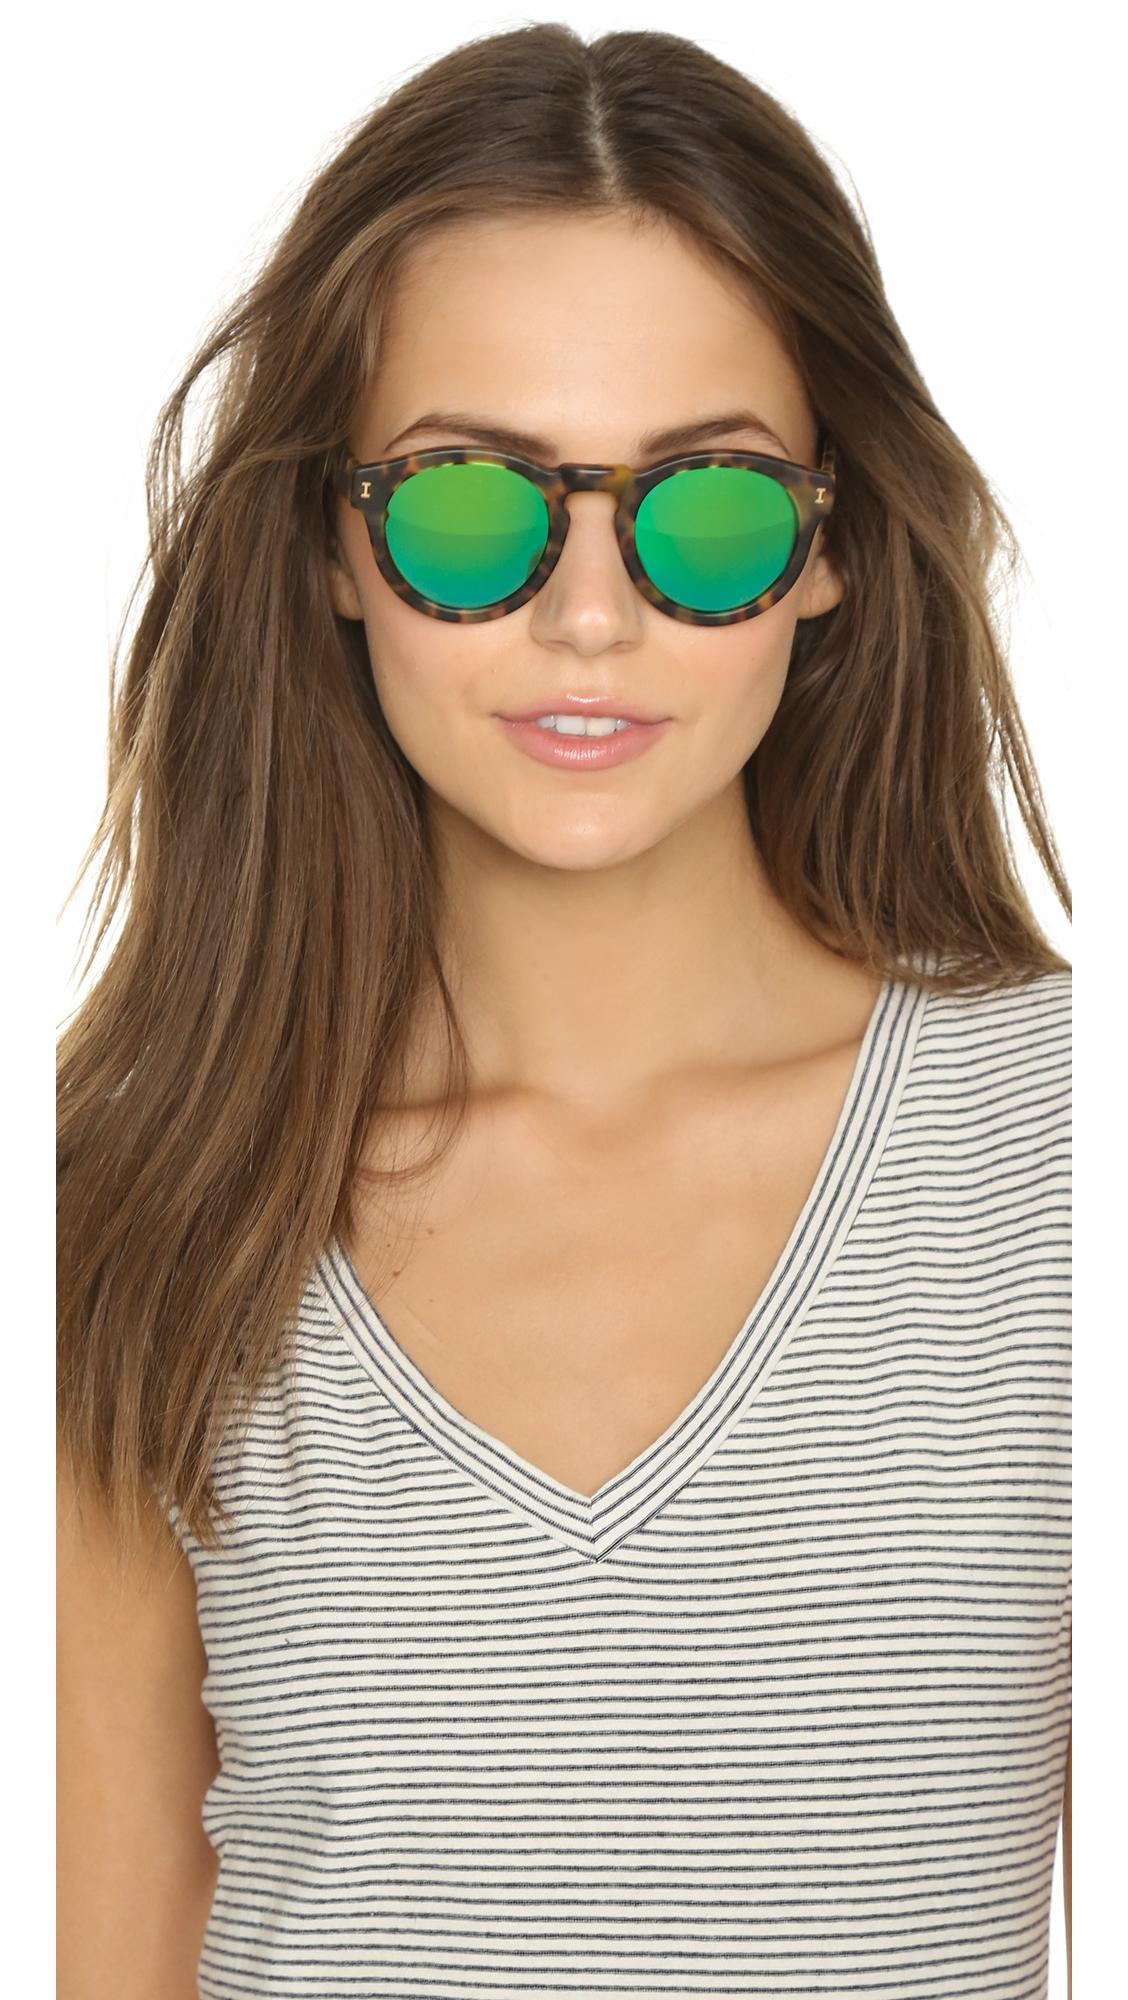 99cbd3107c8 Illesteva Leonard Matte Mirrored Sunglasses